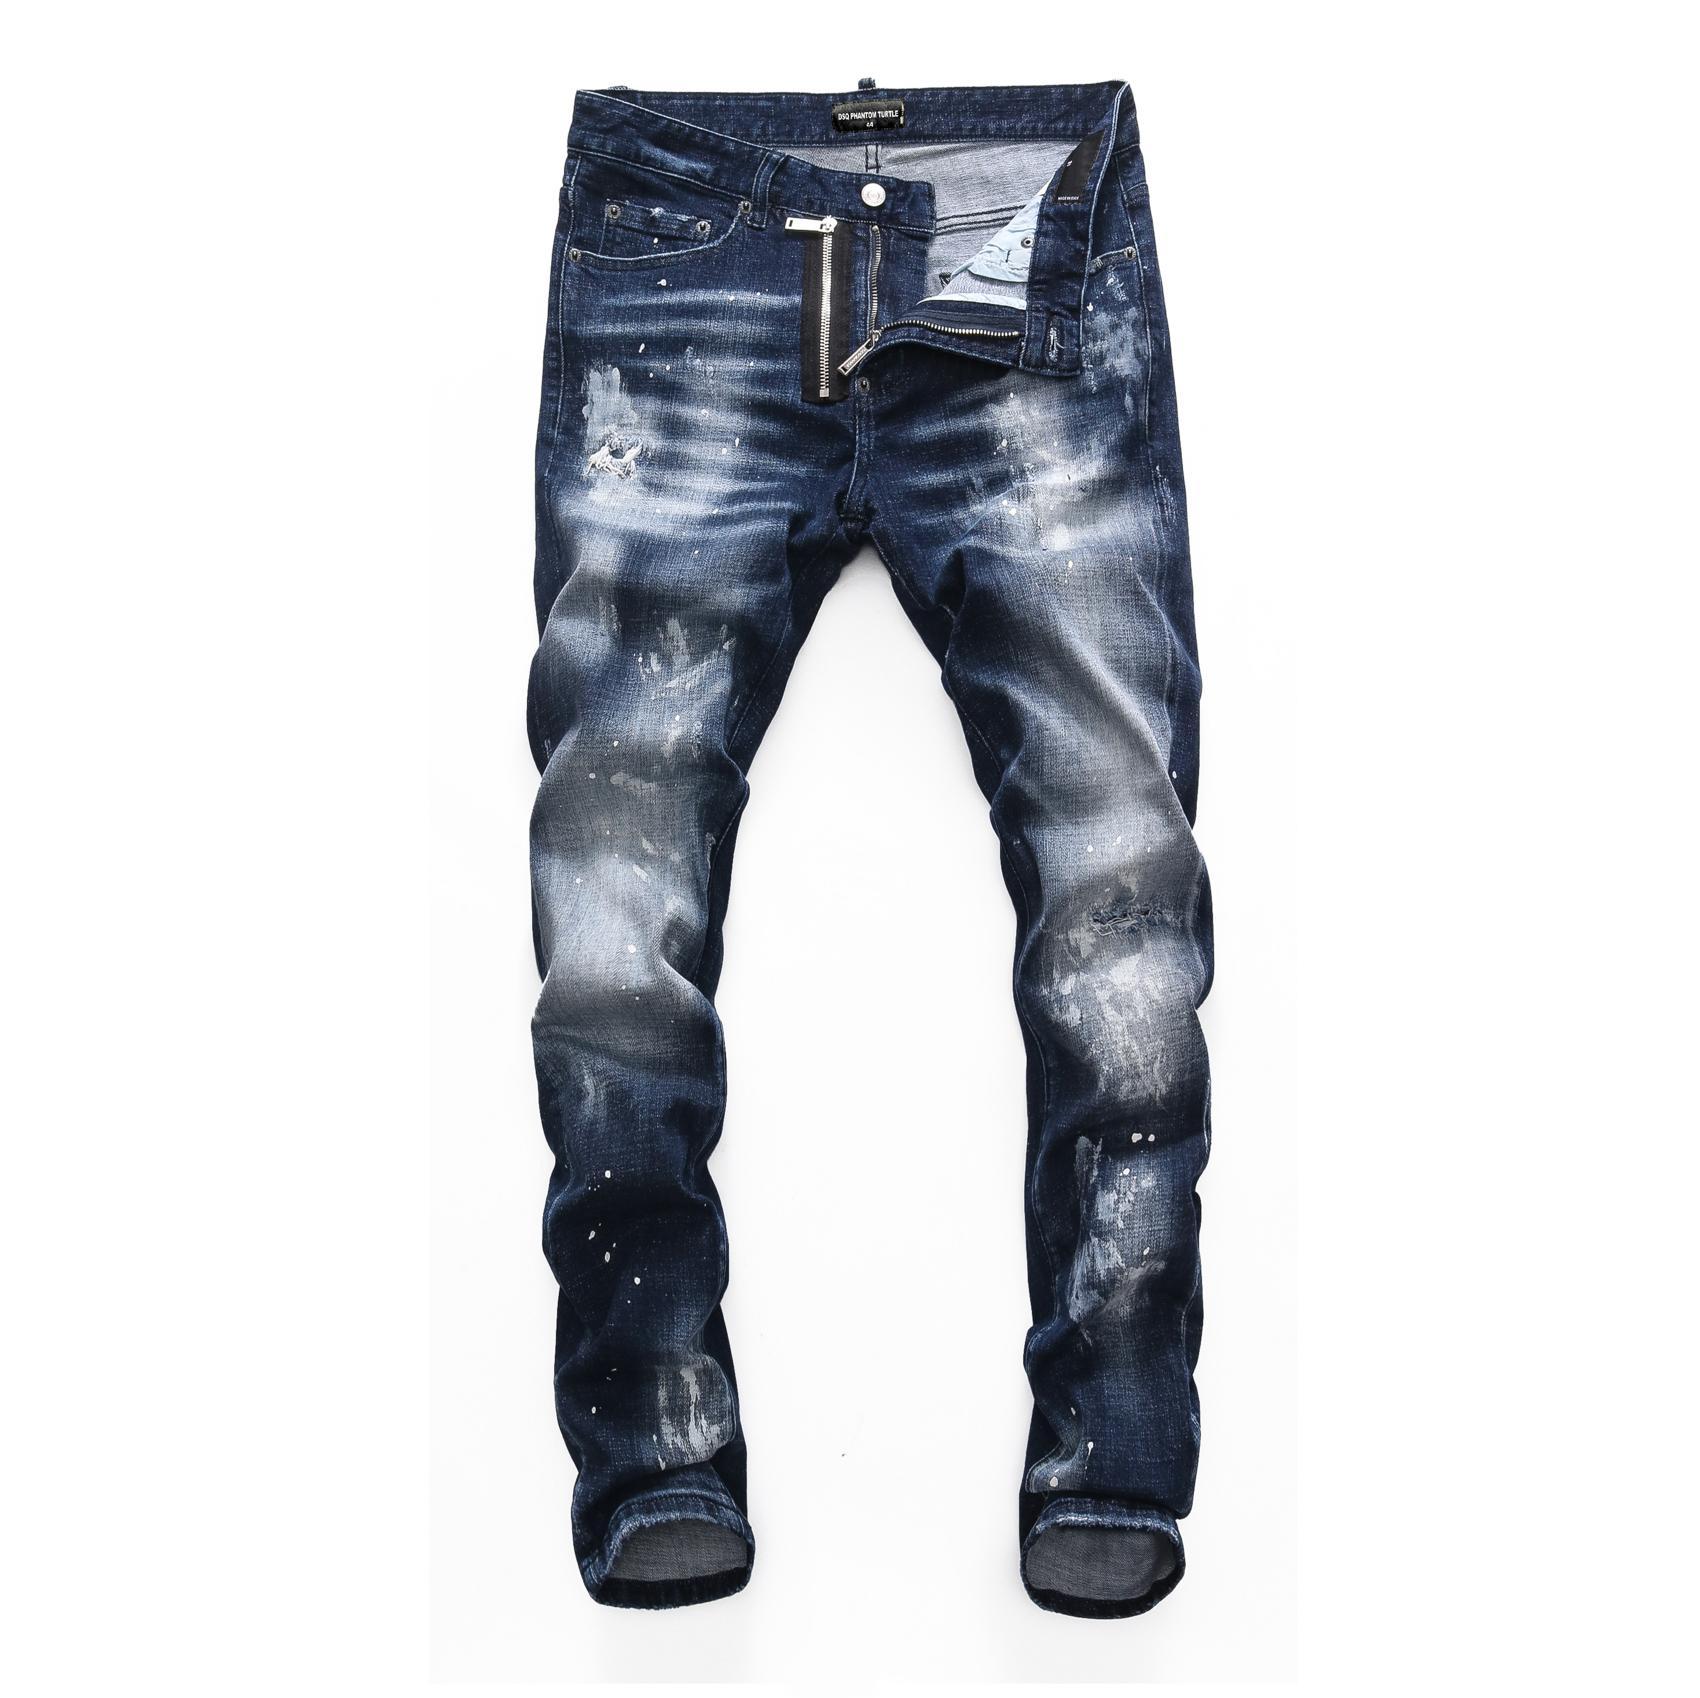 DSQ Phantomschildkröte Perfecto Waschen cooler Kerl Jeans Klassische Mode Mann Hip Hop Rock Moto Herren Casual Design Ripped Beunruhigte Skinny Denim Biker DSQ Jean 10852